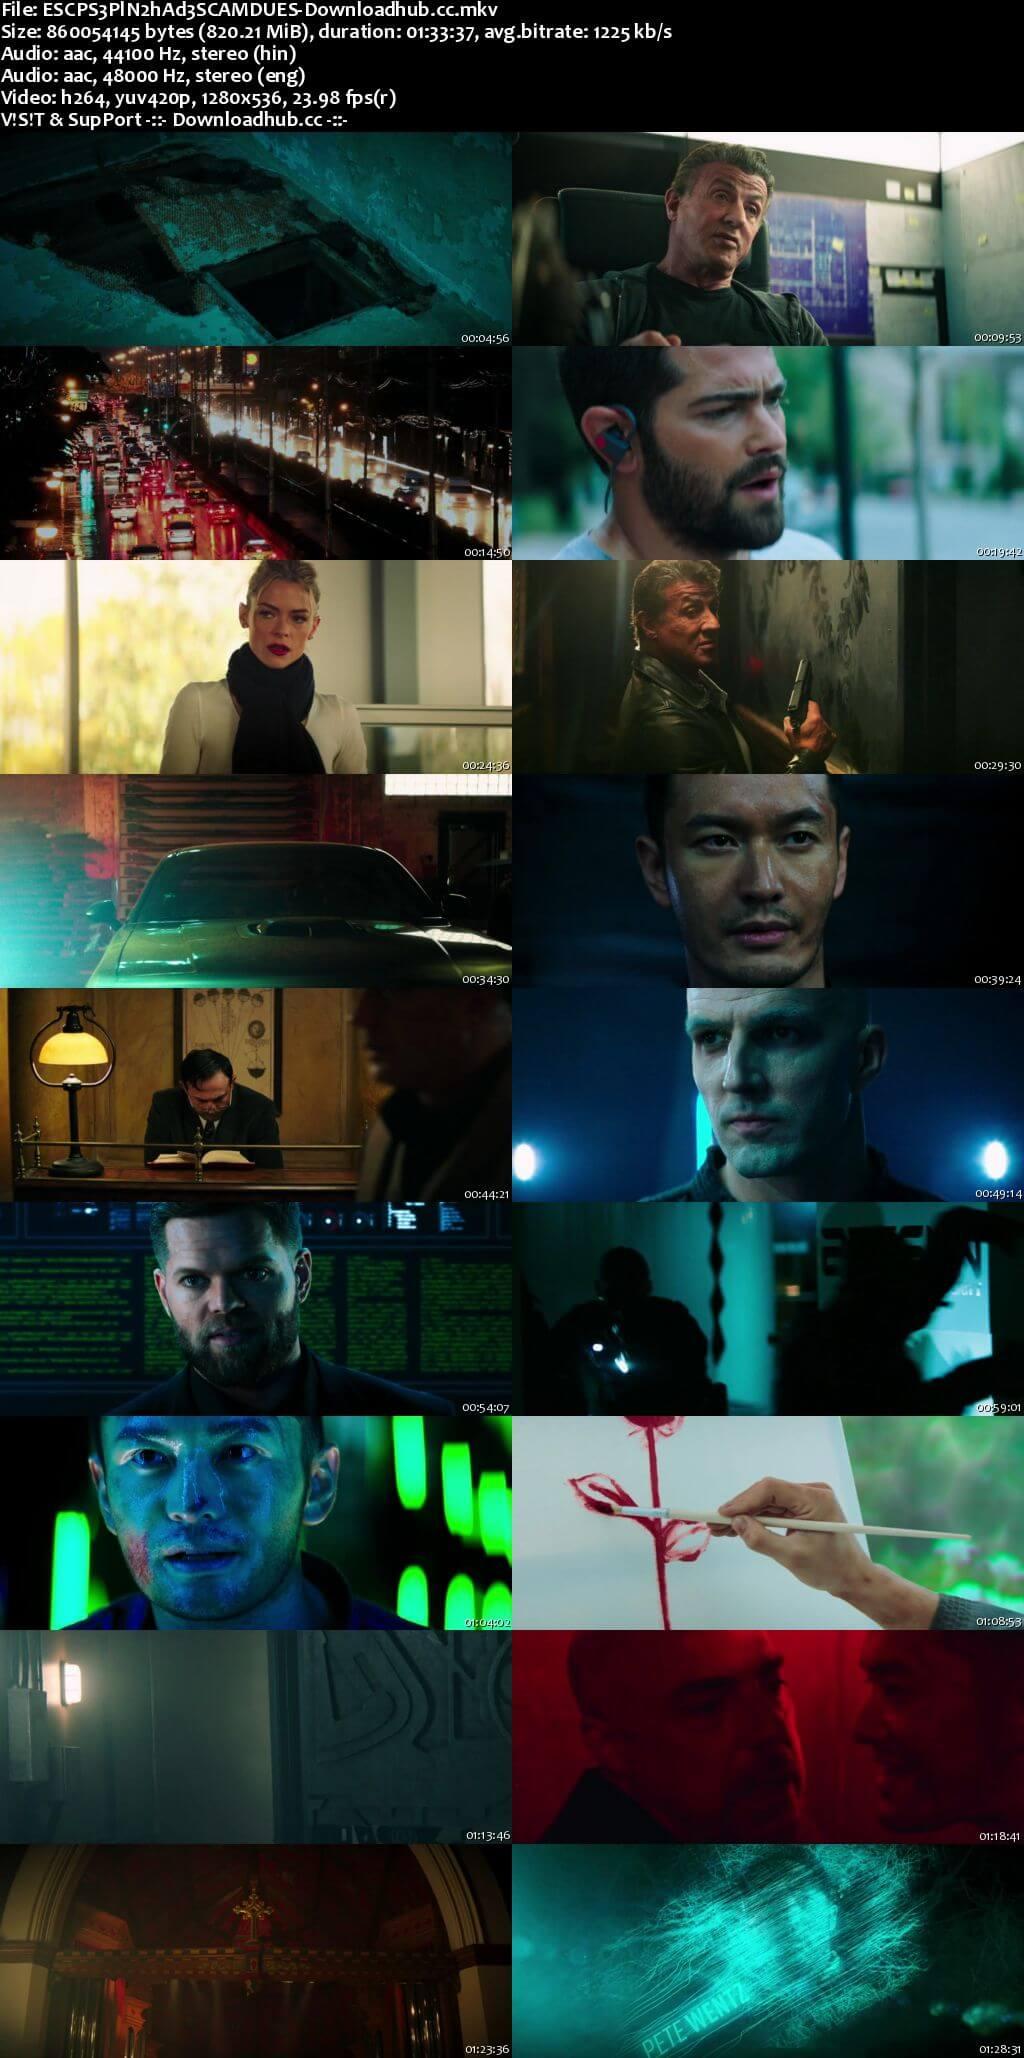 Escape Plan 2 Hades 2018 Dual Audio 720p BluRay [Hindi (Cleaned) - English] ESubs